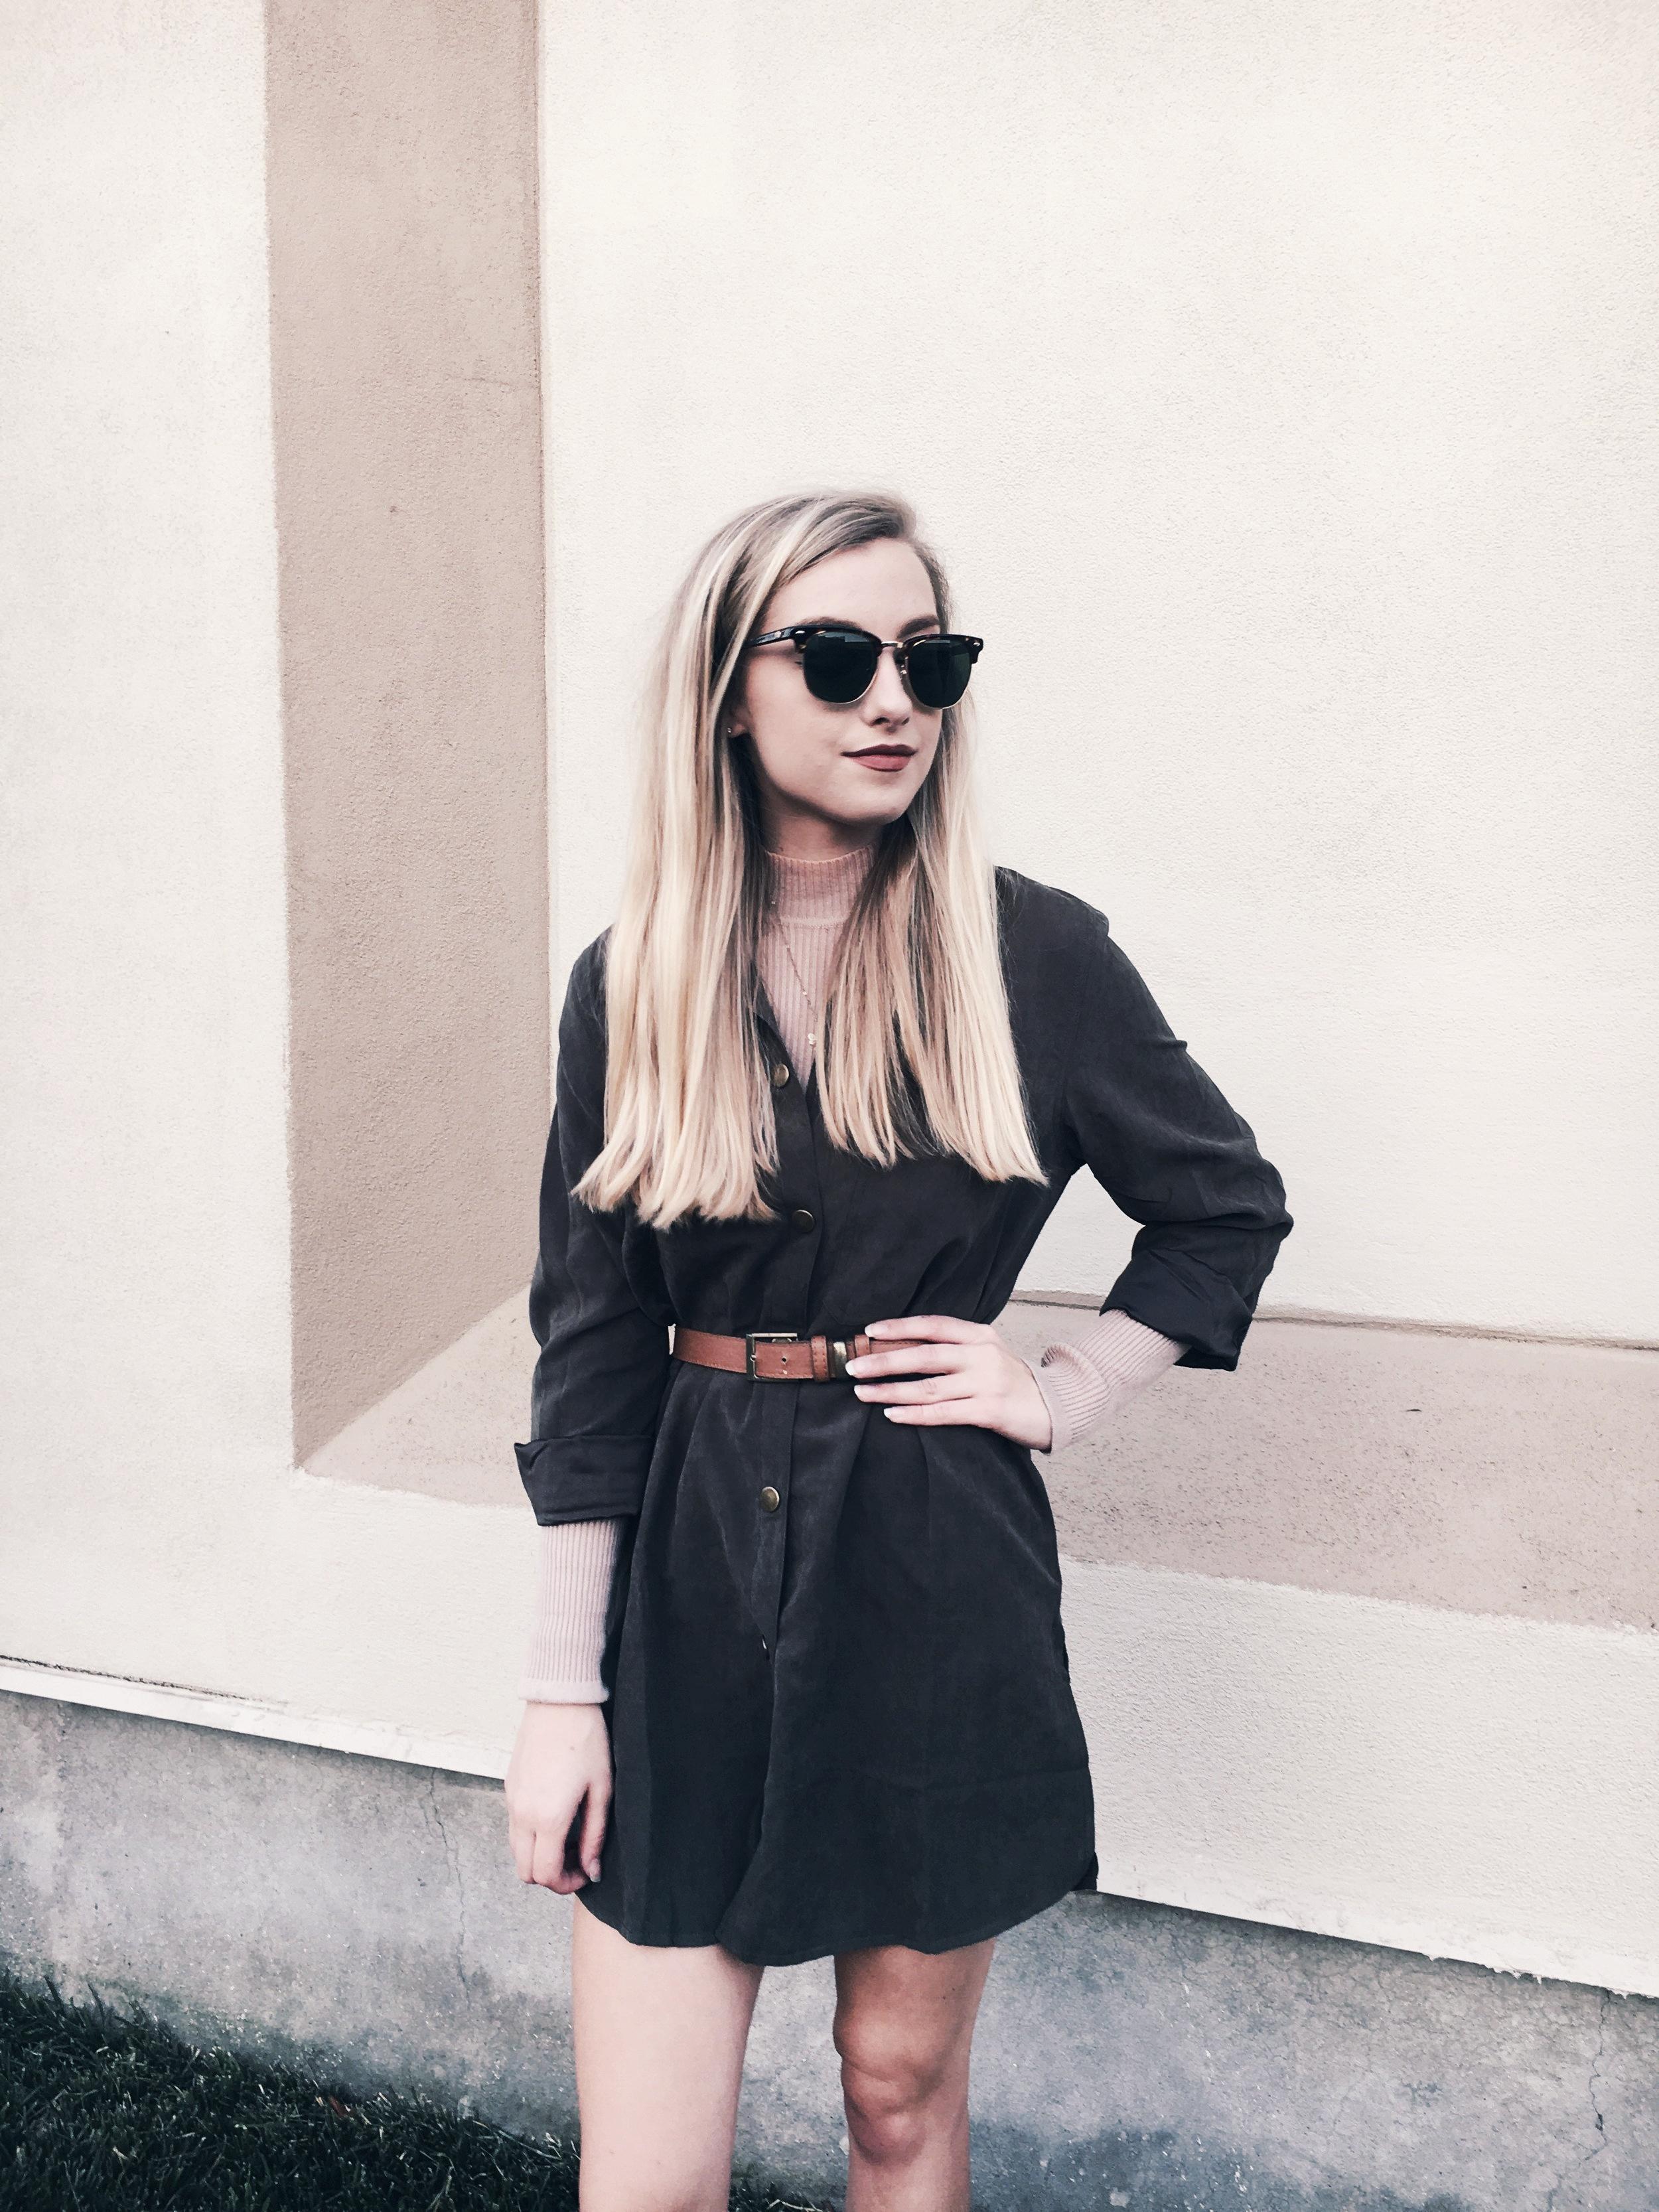 Sunglass: Brightside Eyewear, Turtleneck: Forever21, Dress: Shein, Belt: Forever21, Shoes: Zara